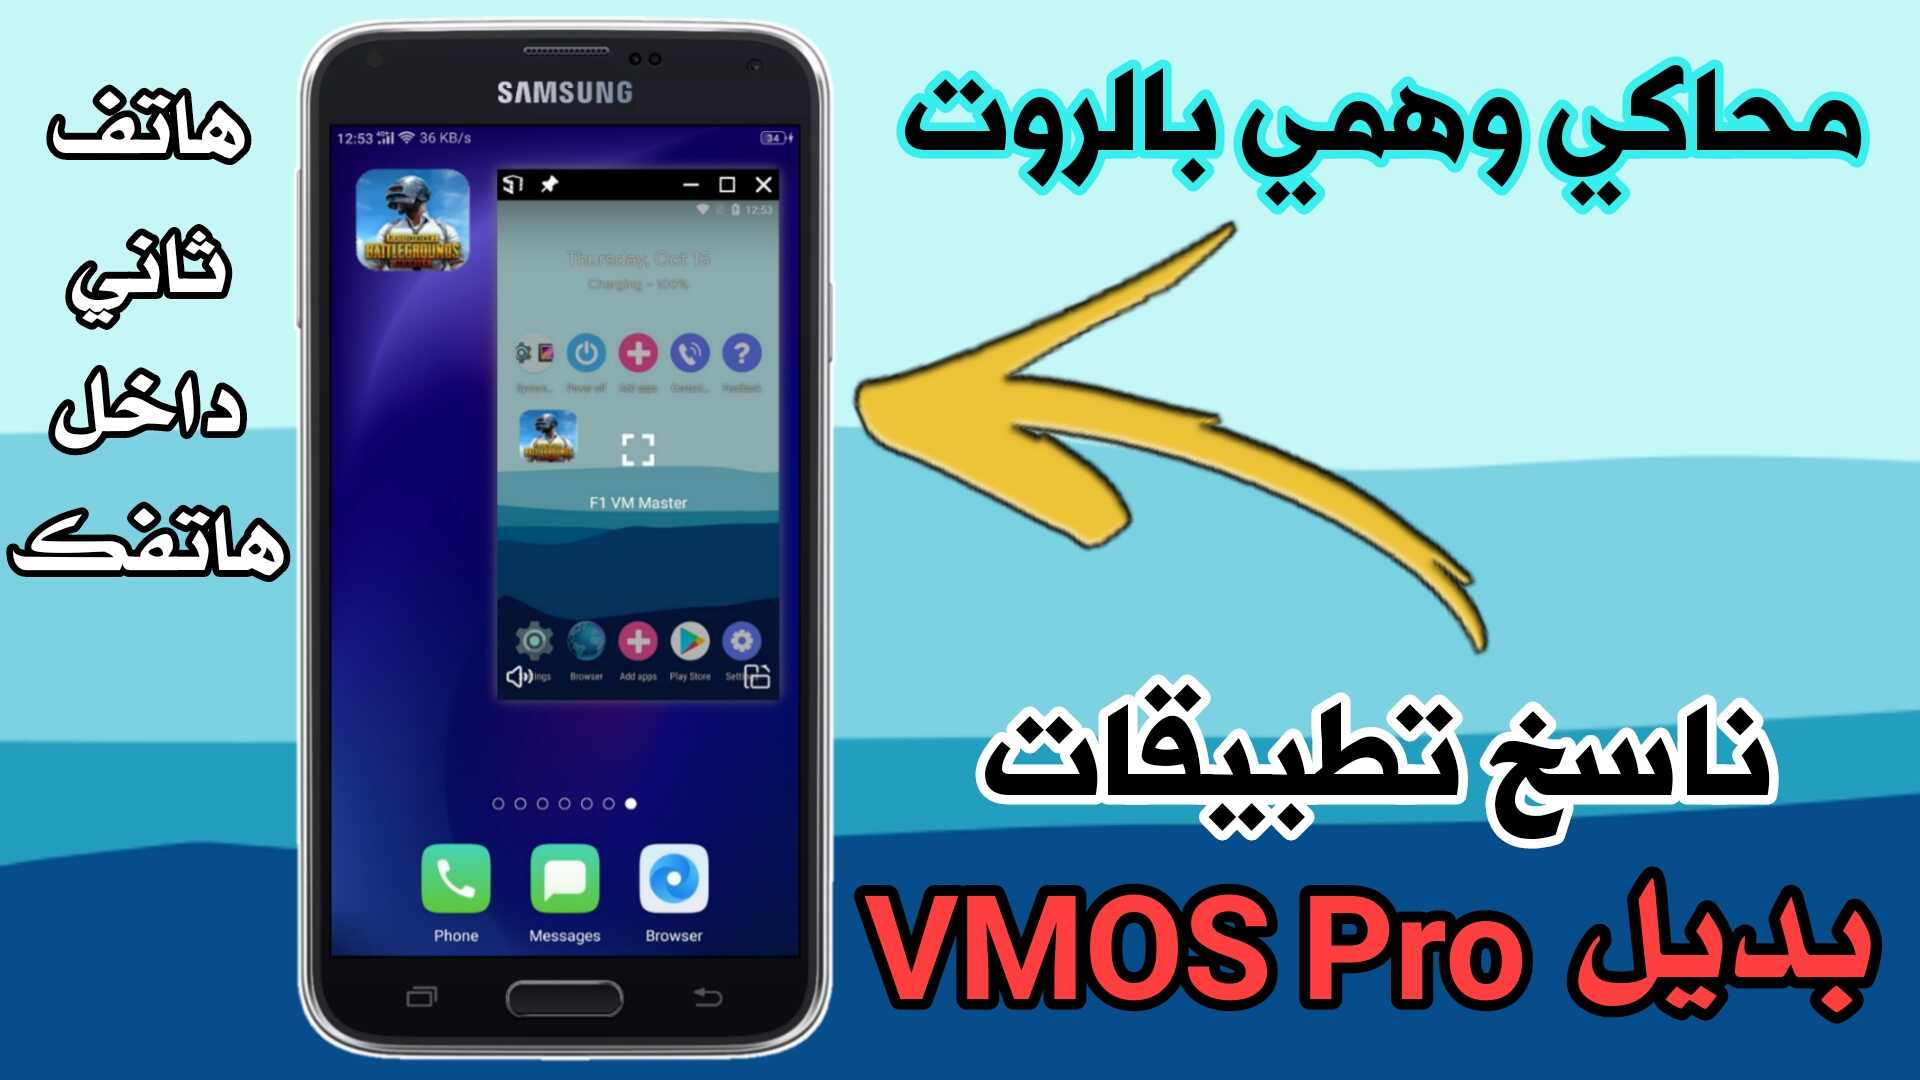 محاكي وهمي بالروت بديل VMOS Pro ناسخ تطبيقات للاندرويد